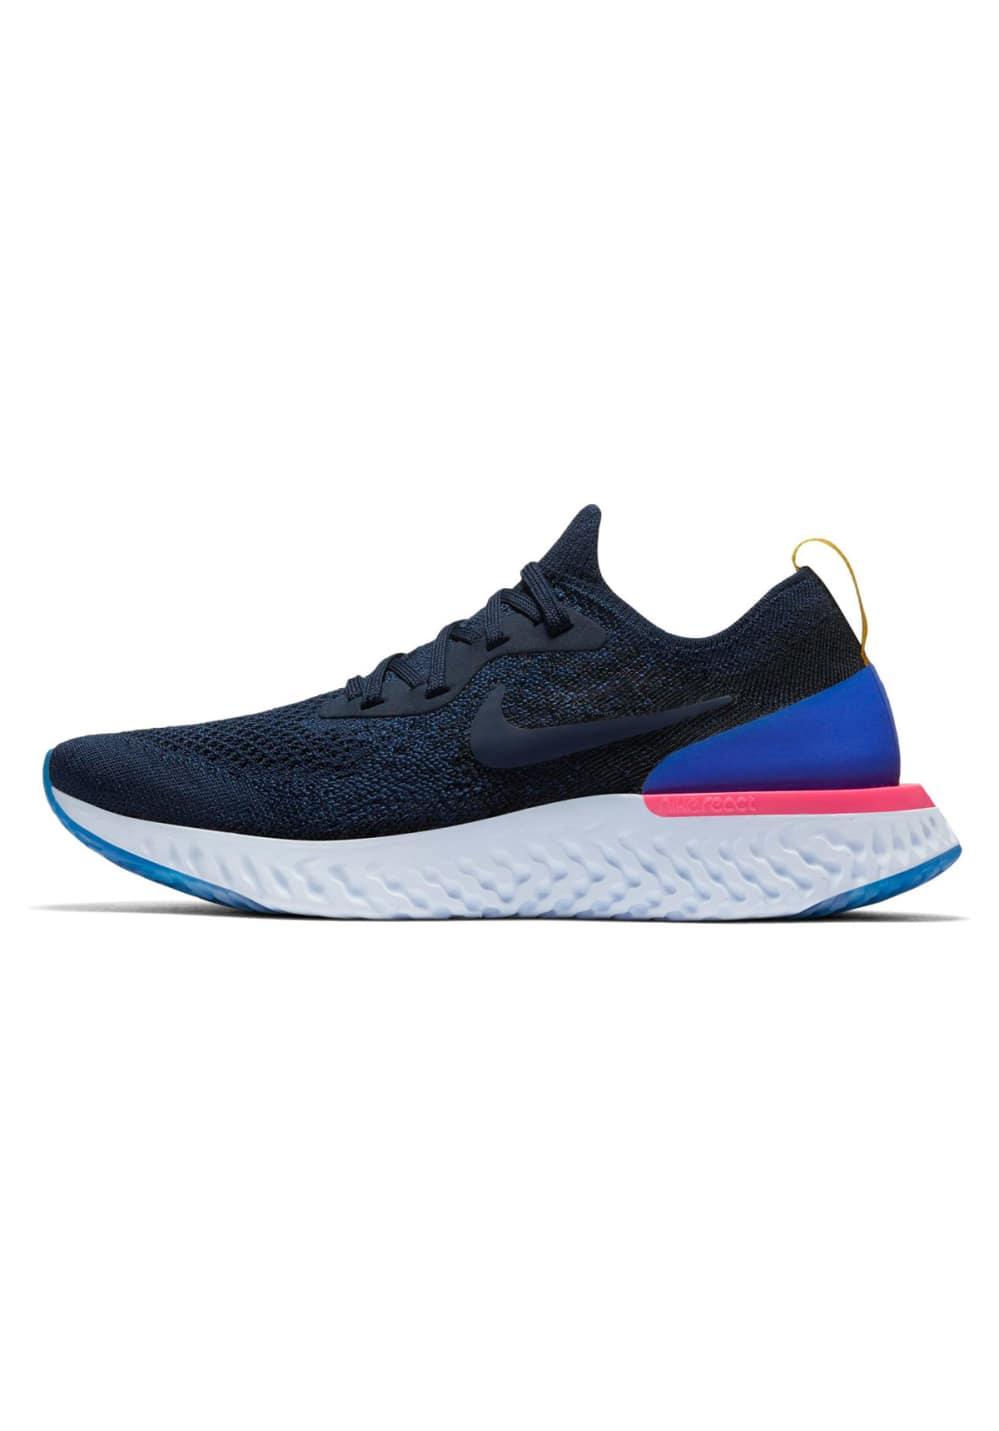 Nike Epic React Flyknit - Laufschuhe für Damen - Blau